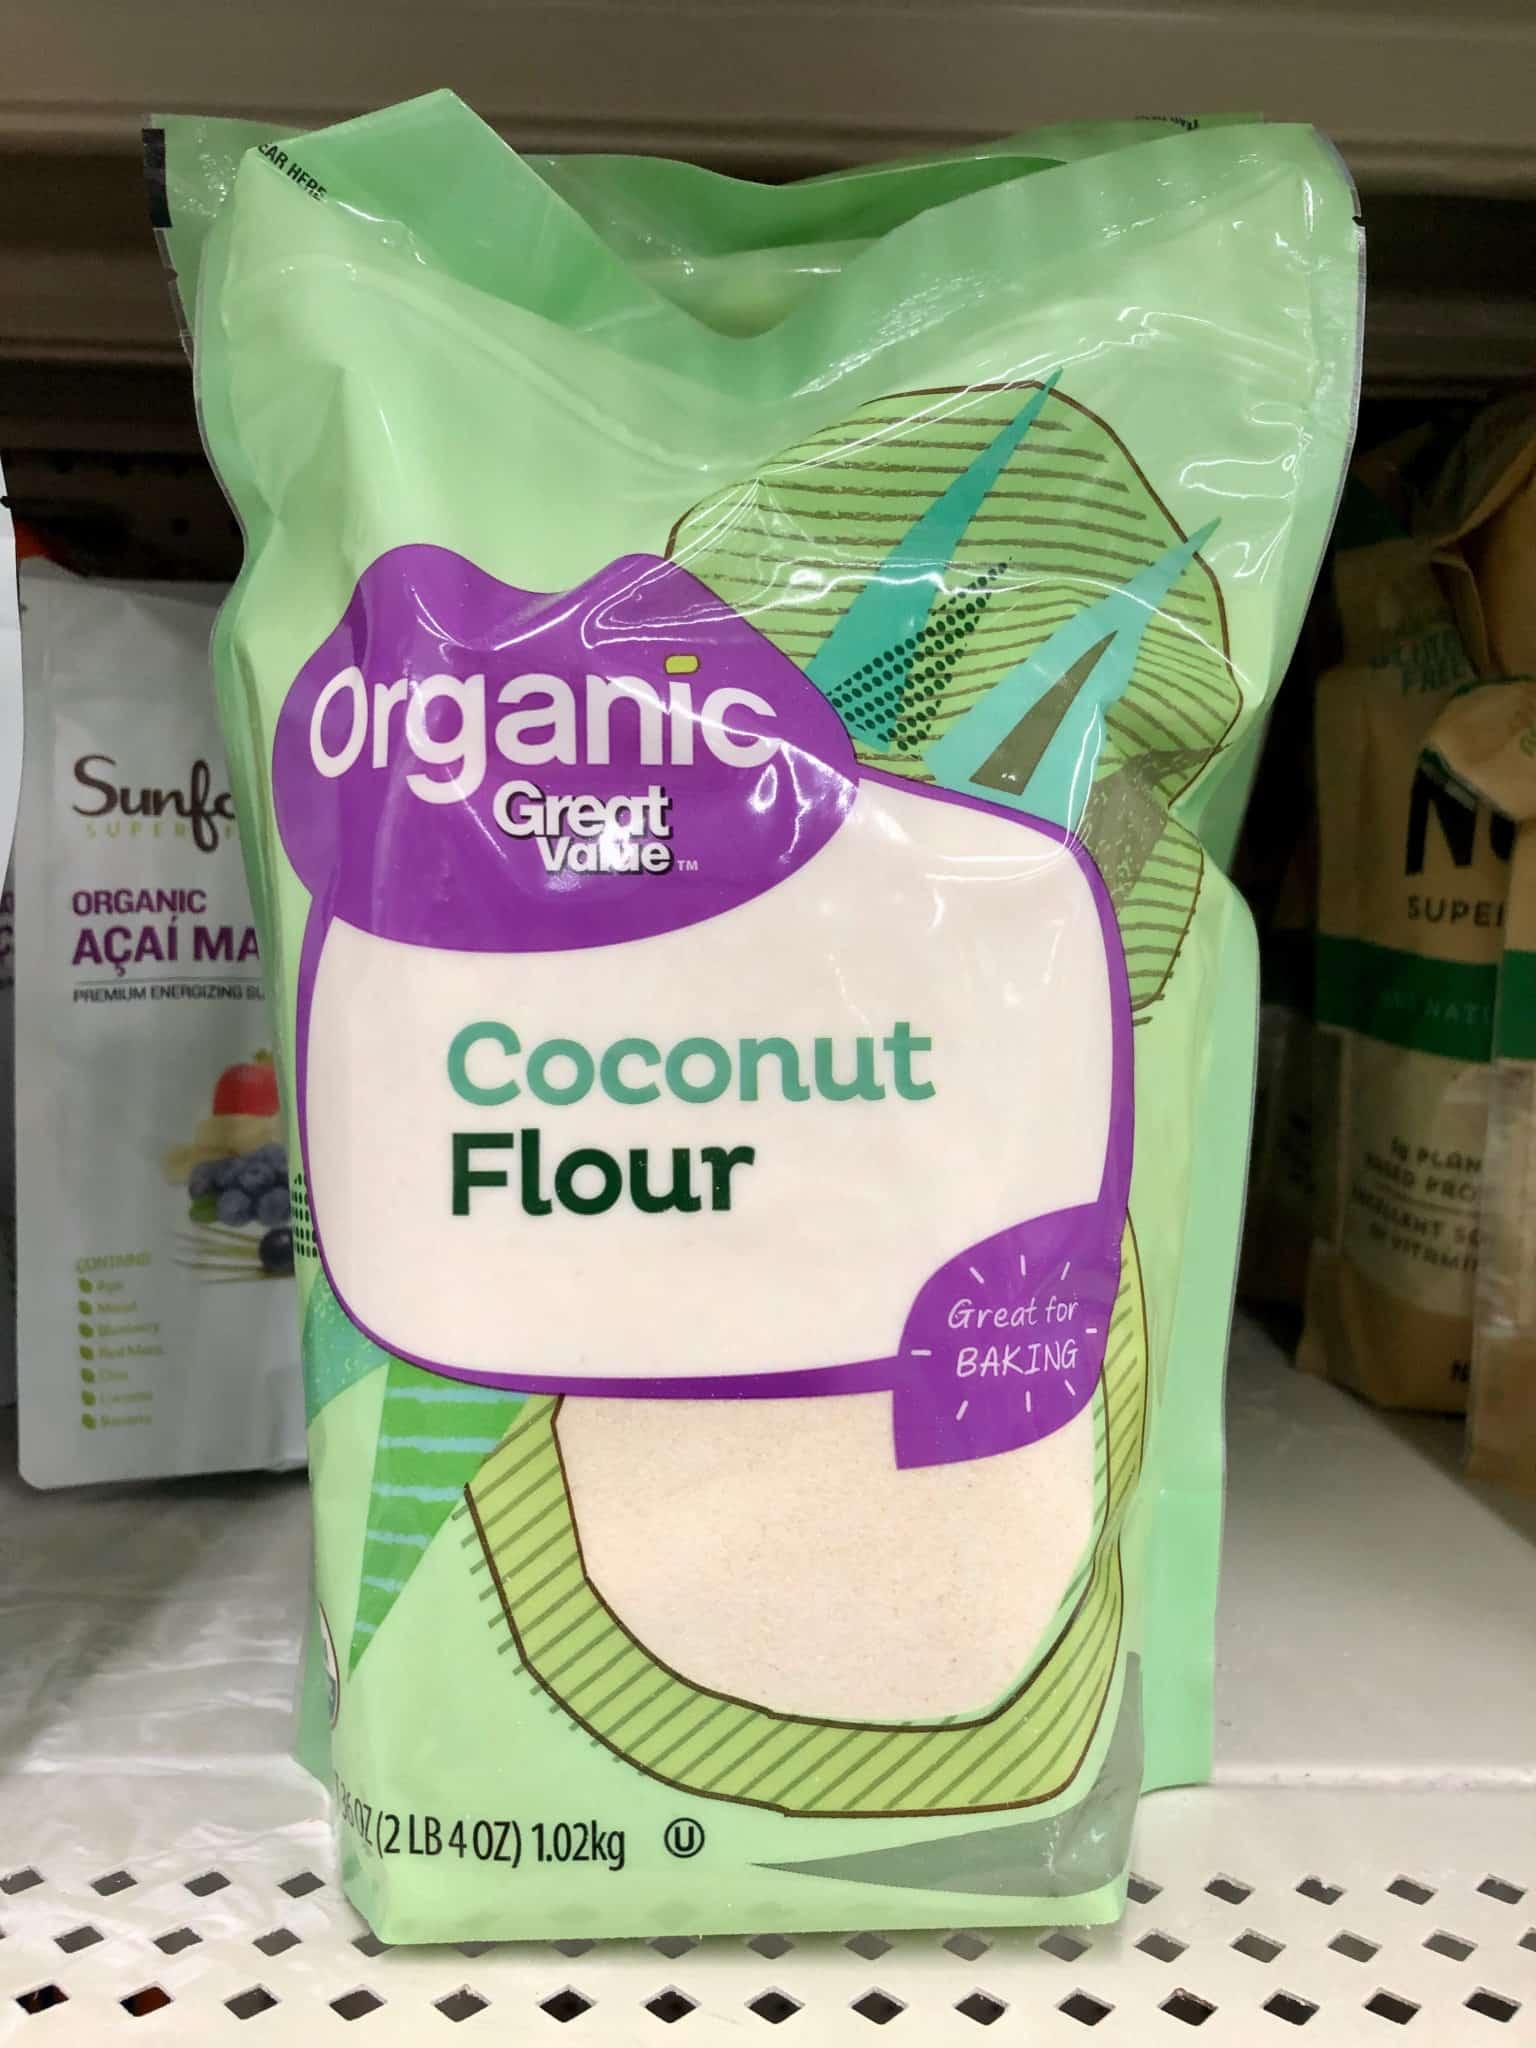 bag of great value coconut flour